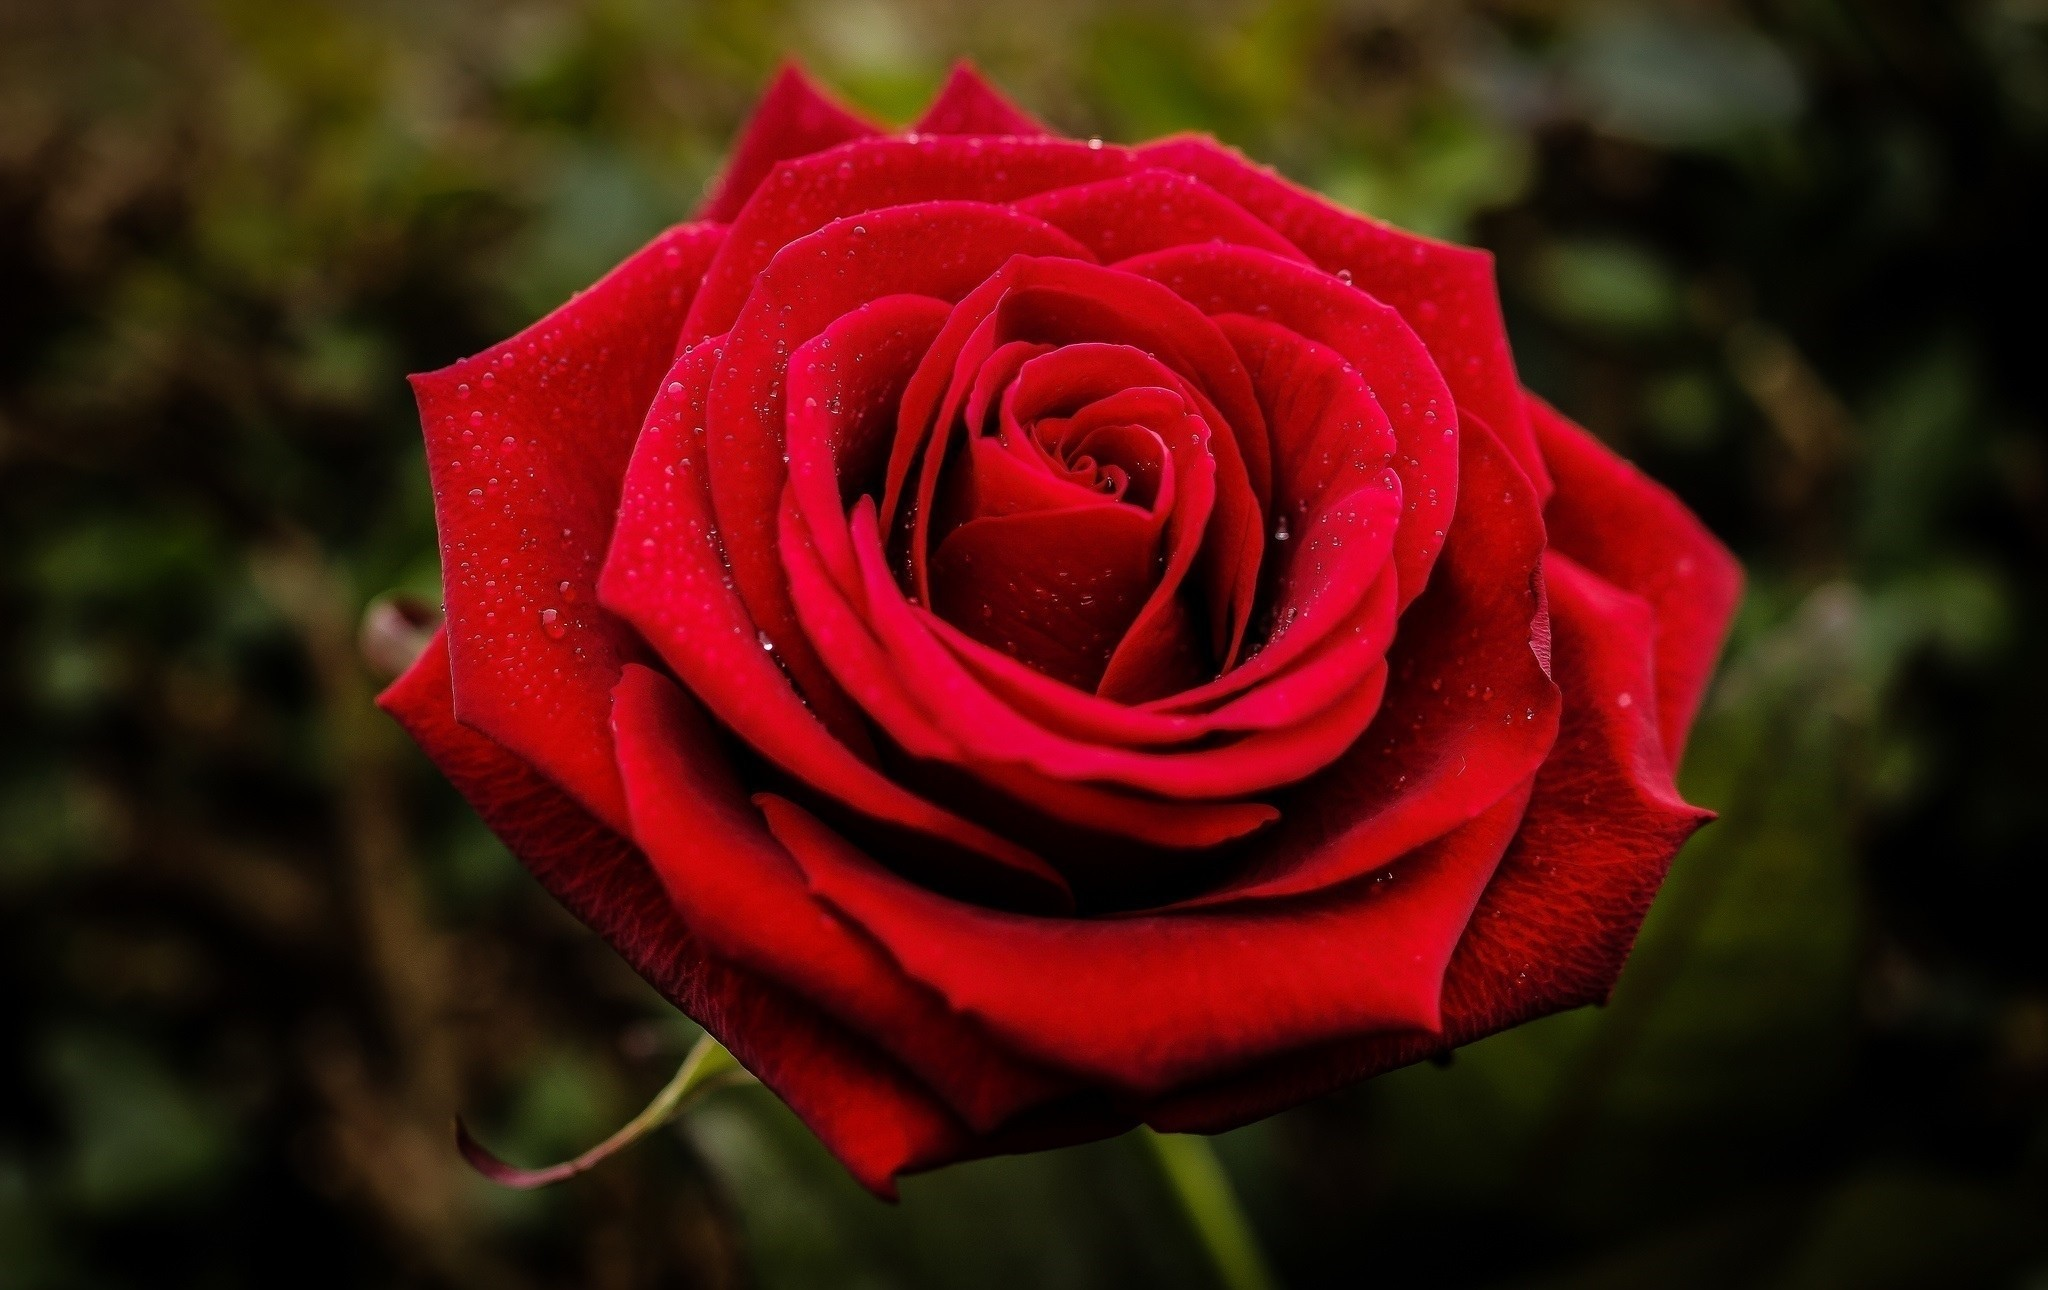 Flowers: Beautiful Rose Closeup Red Flower Hd Wallpaper Download ...